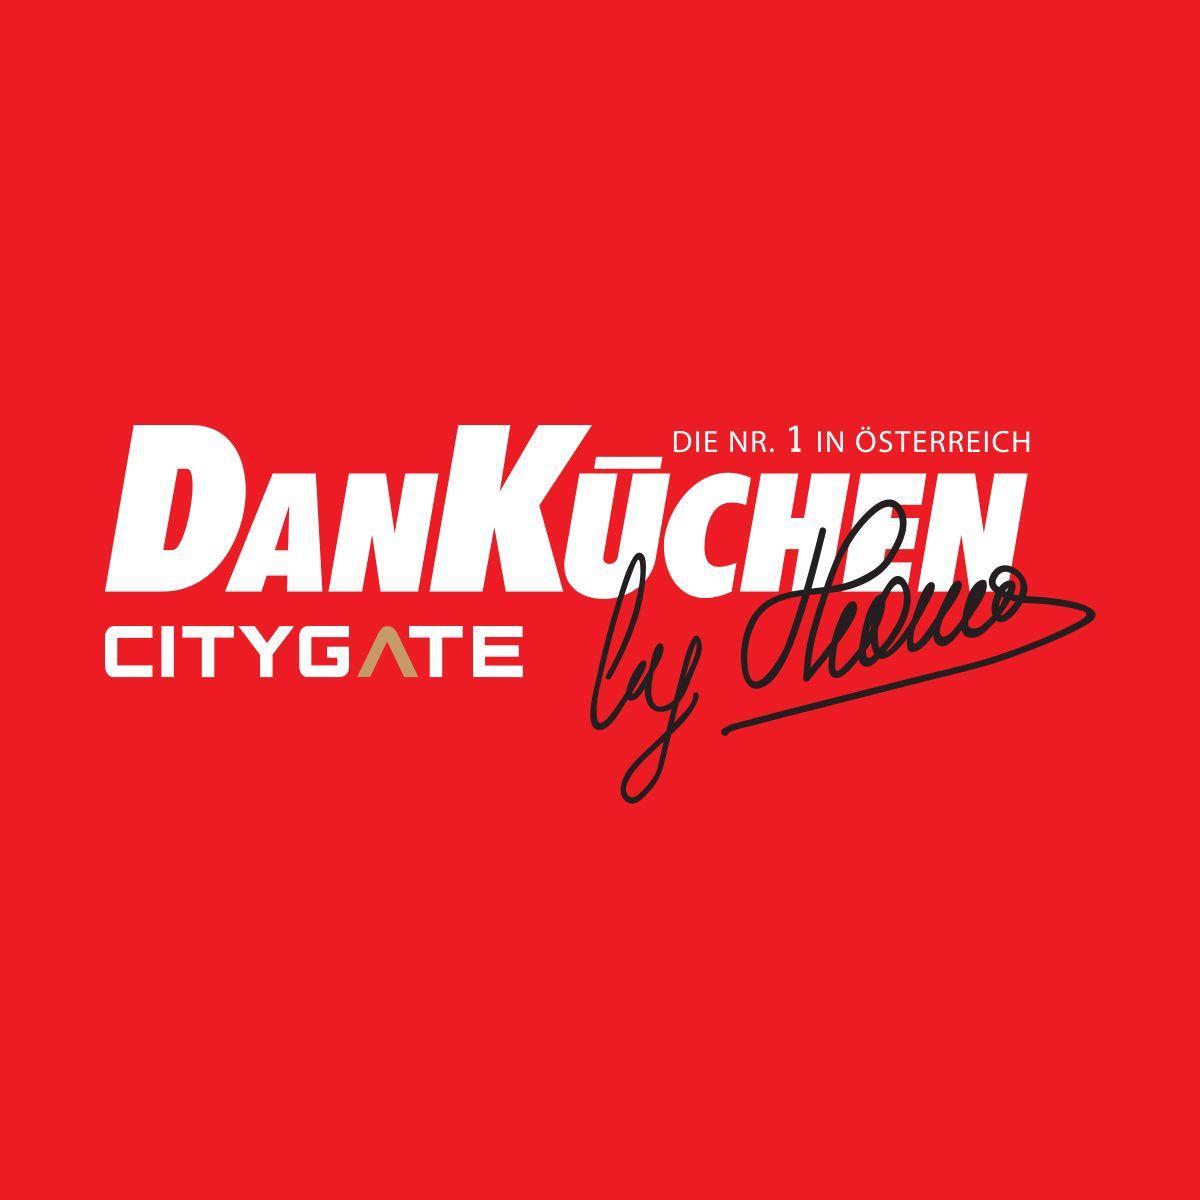 DAN Küchen Citygate Wien - Küchenplanung, Küchendesign ... | {Dan küchen logo 5}